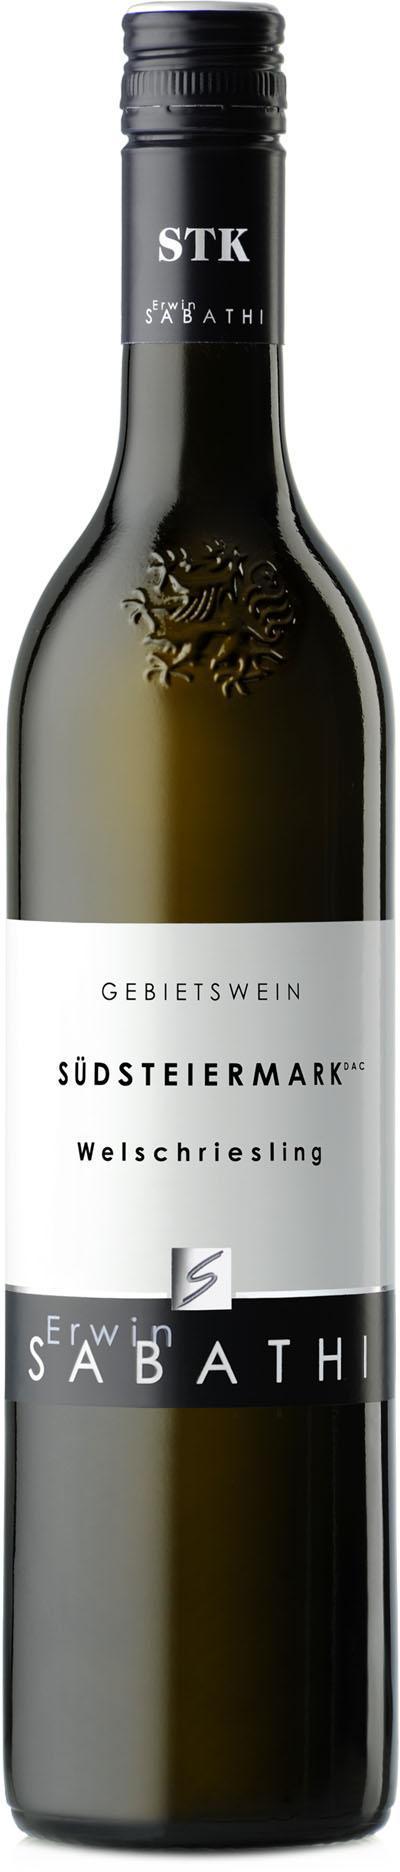 Welschriesling Südsteiermark DAC 2019 / Sabathi Erwin